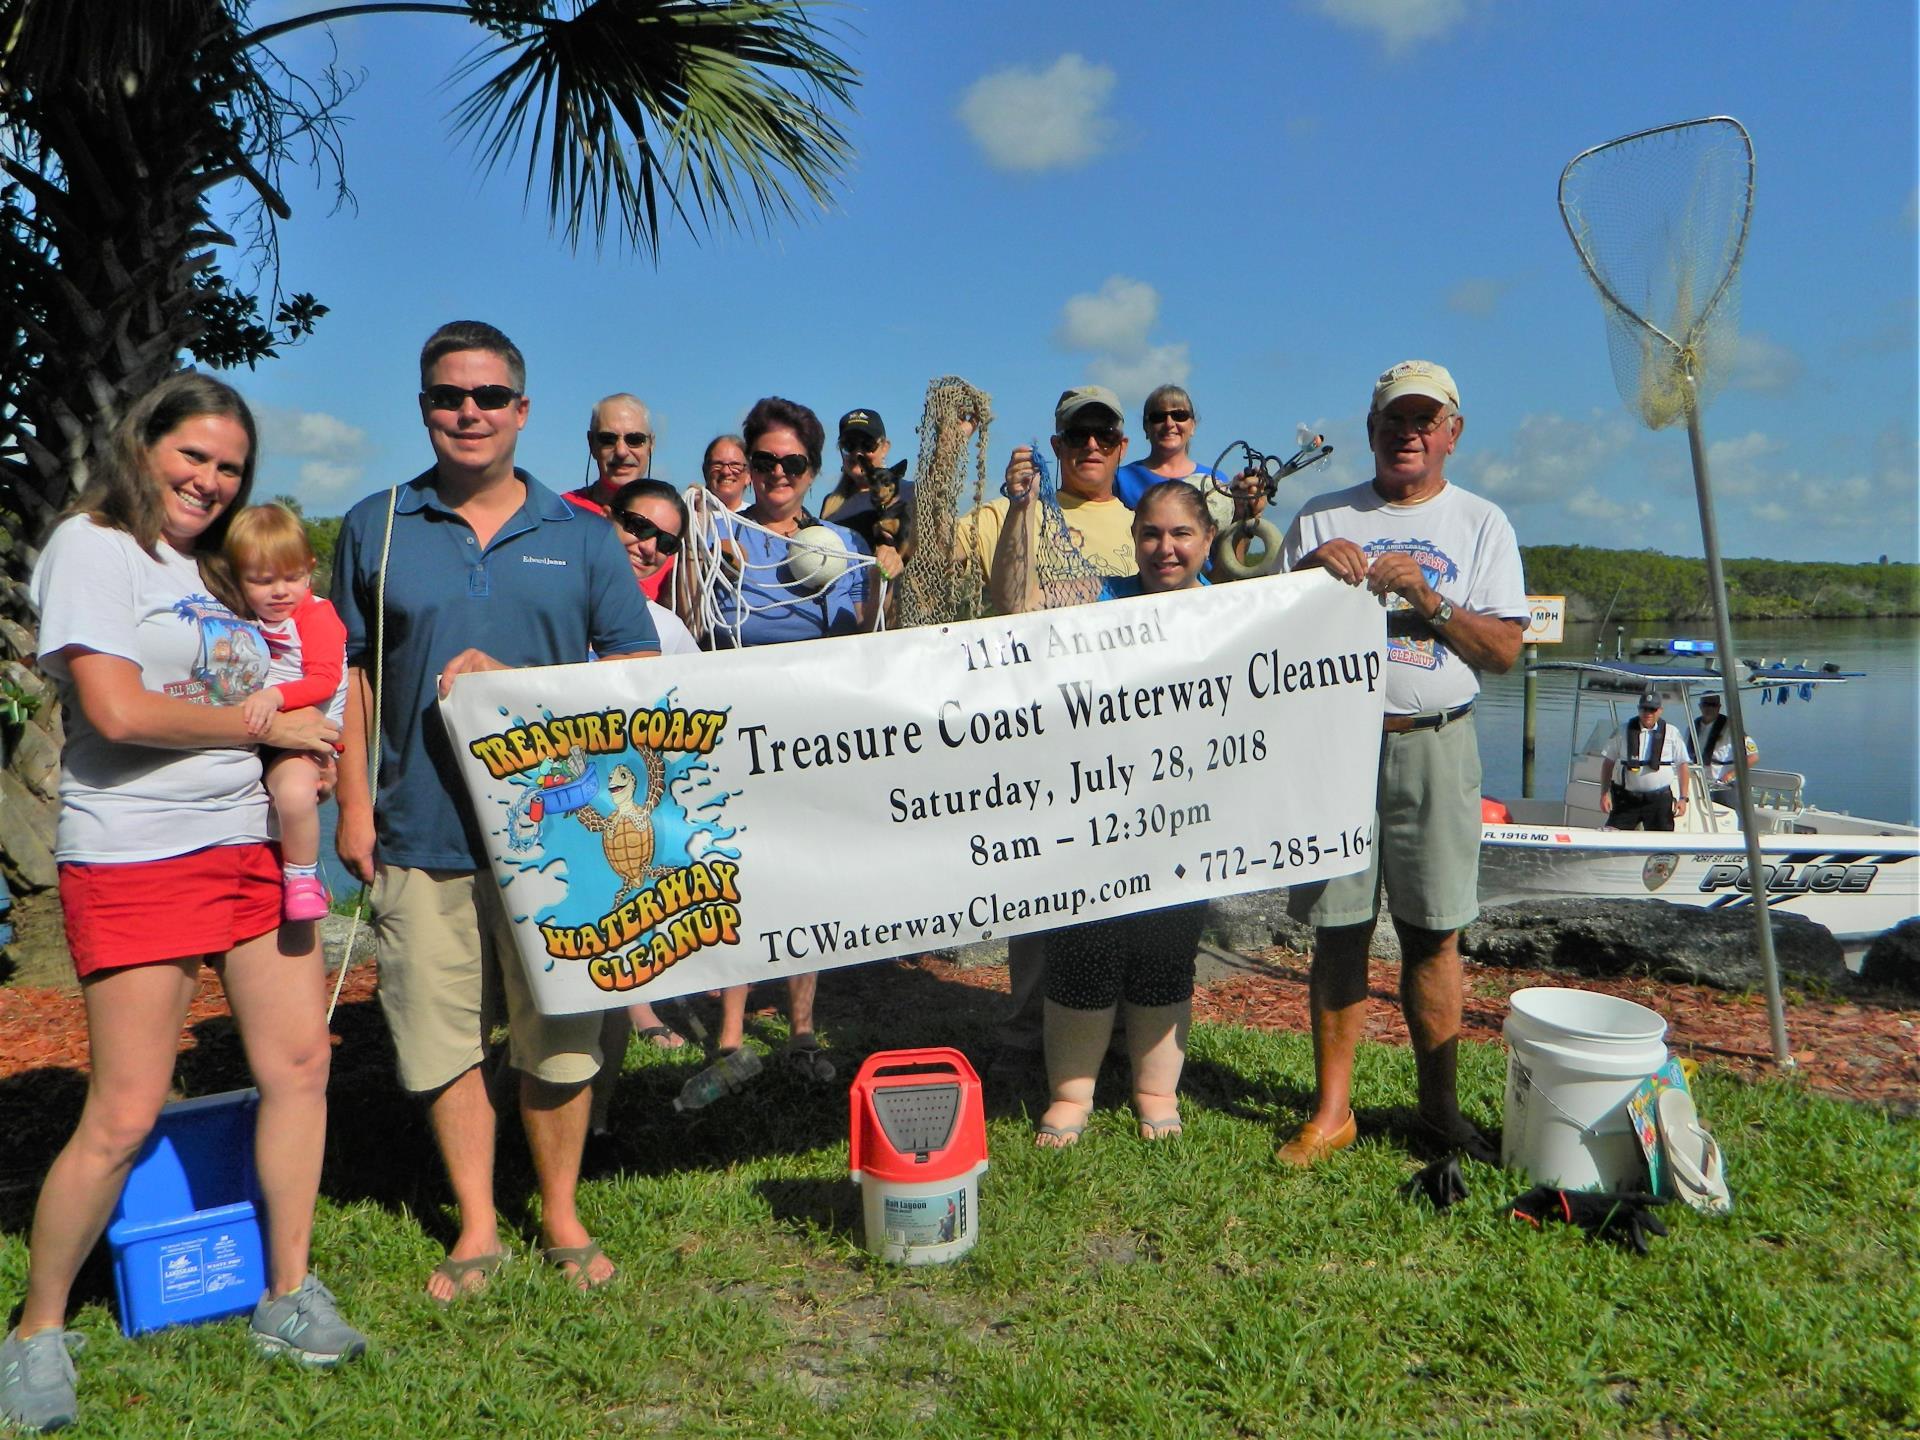 2018 TC Waterway Cleanup Team Photo